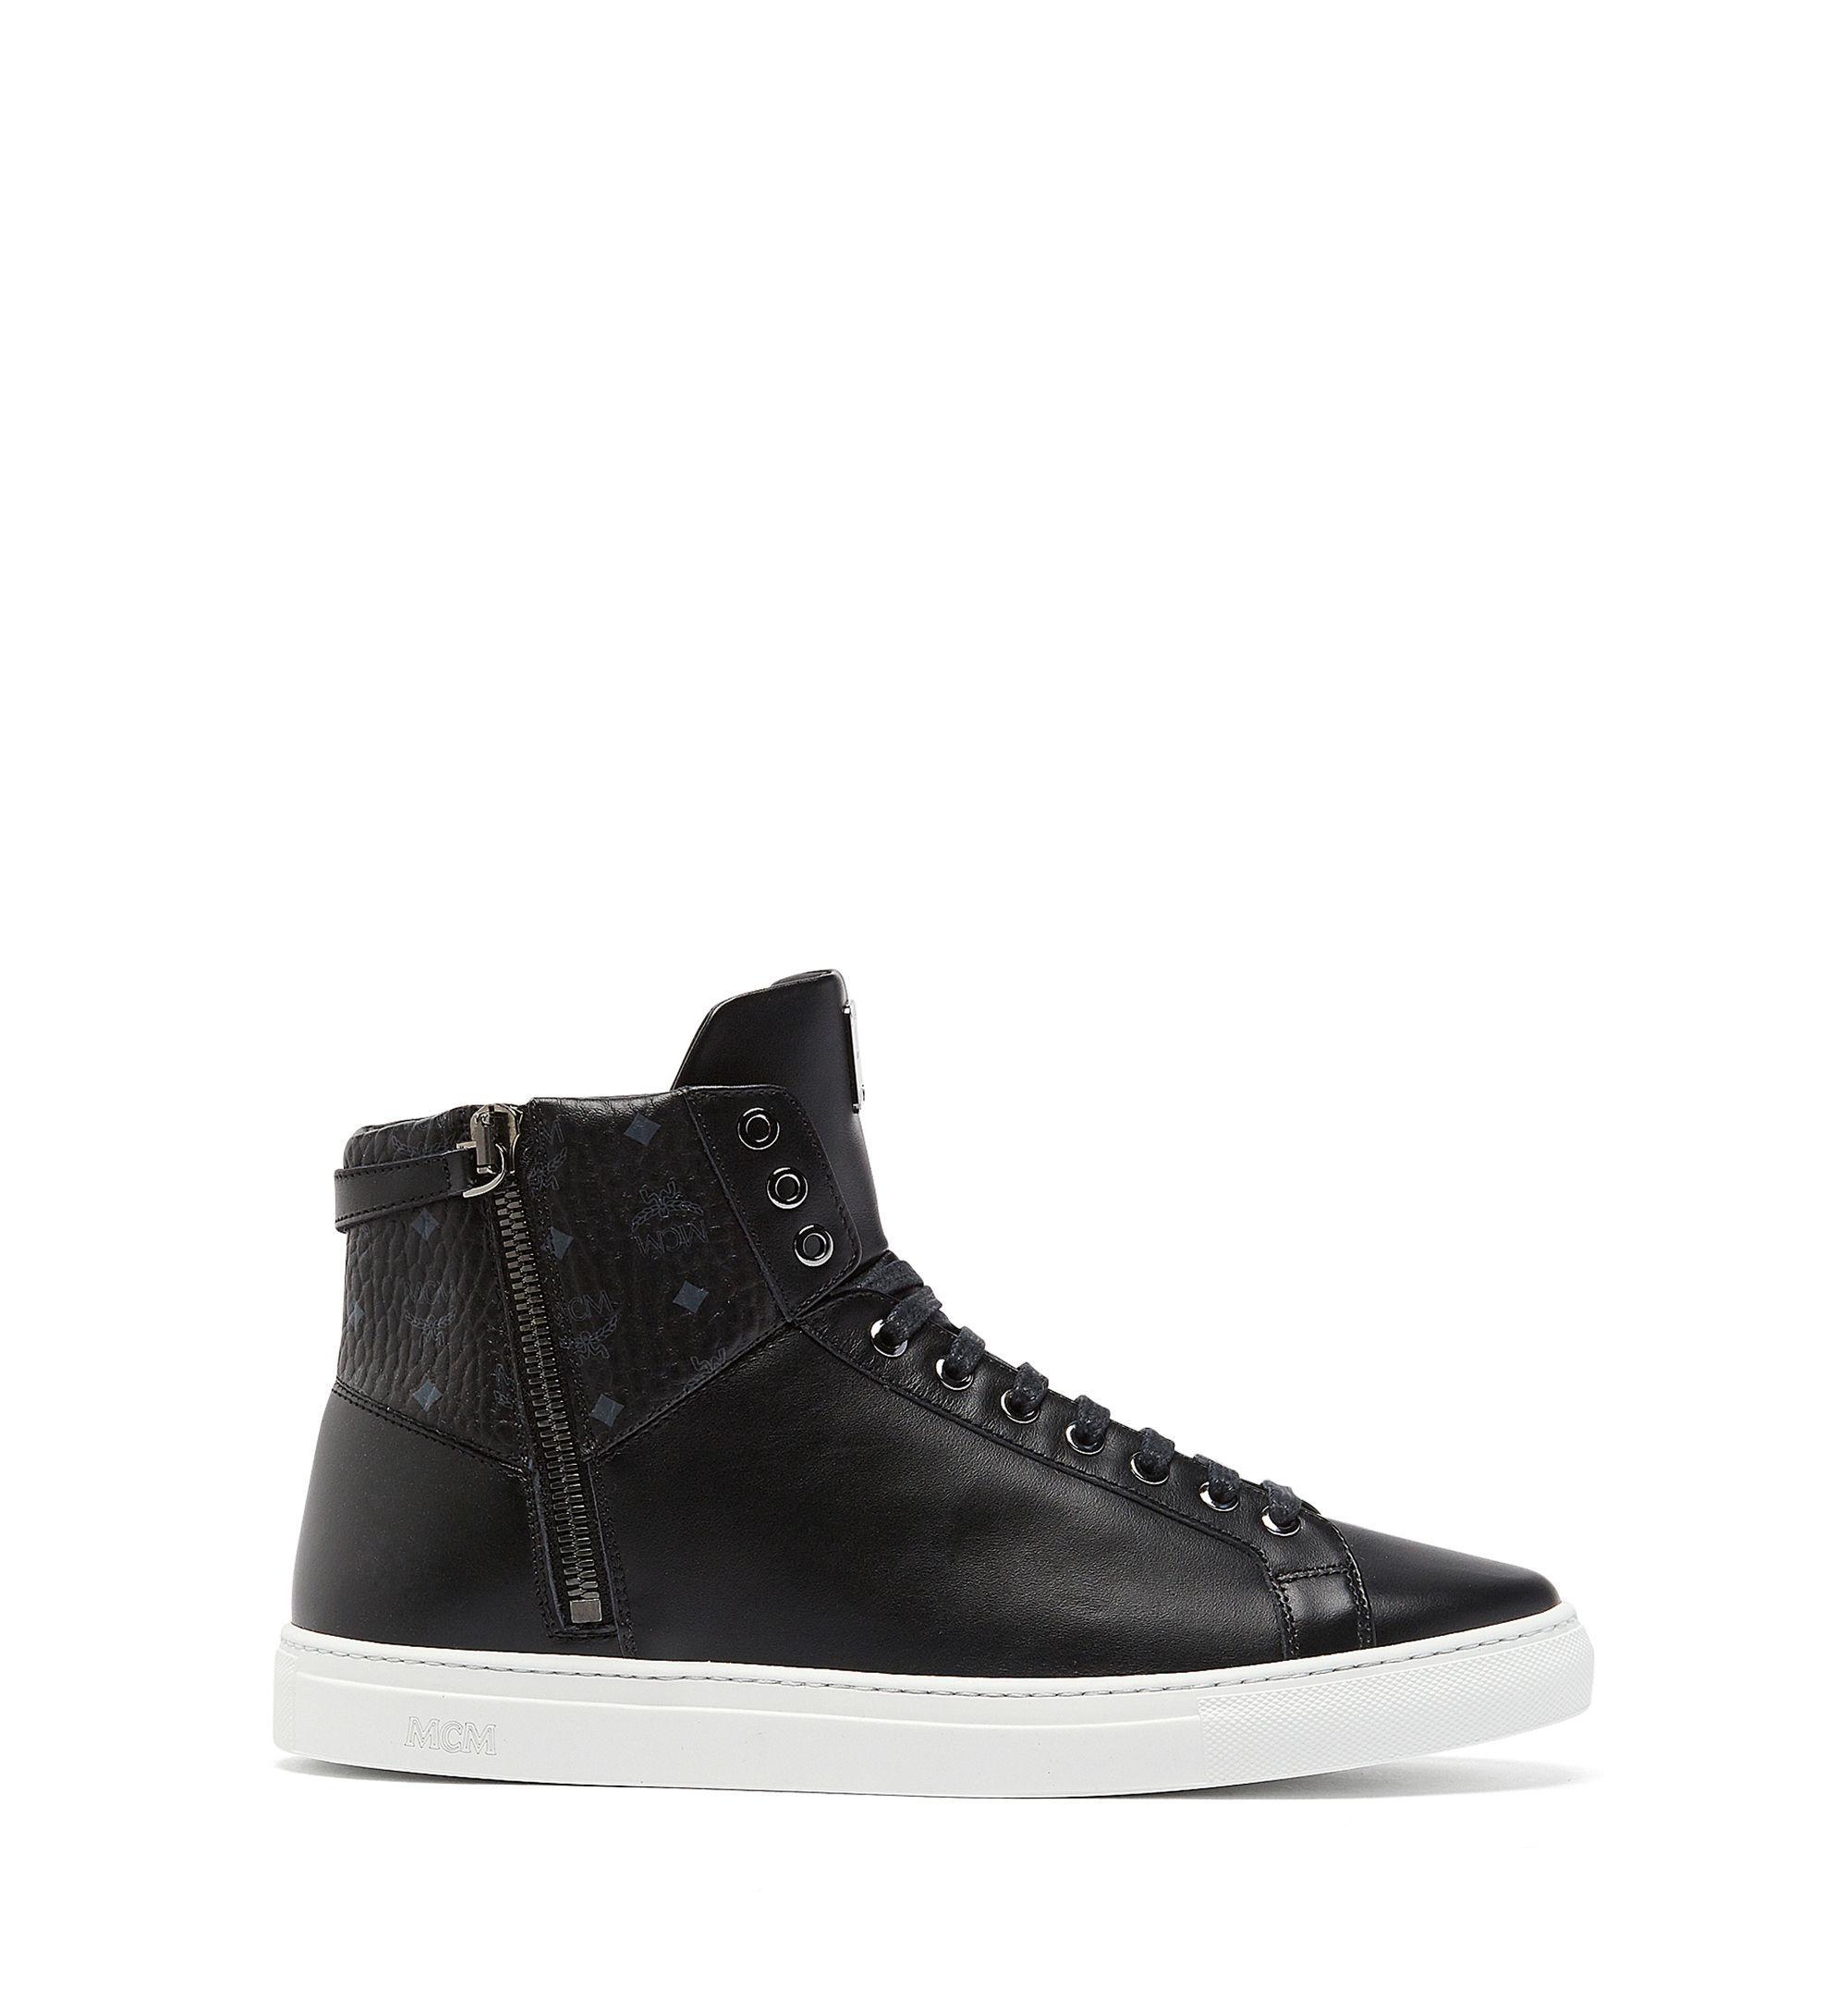 43ca25dcea5 Lyst - MCM High Top Classic Zip Sneakers In Leather in Black